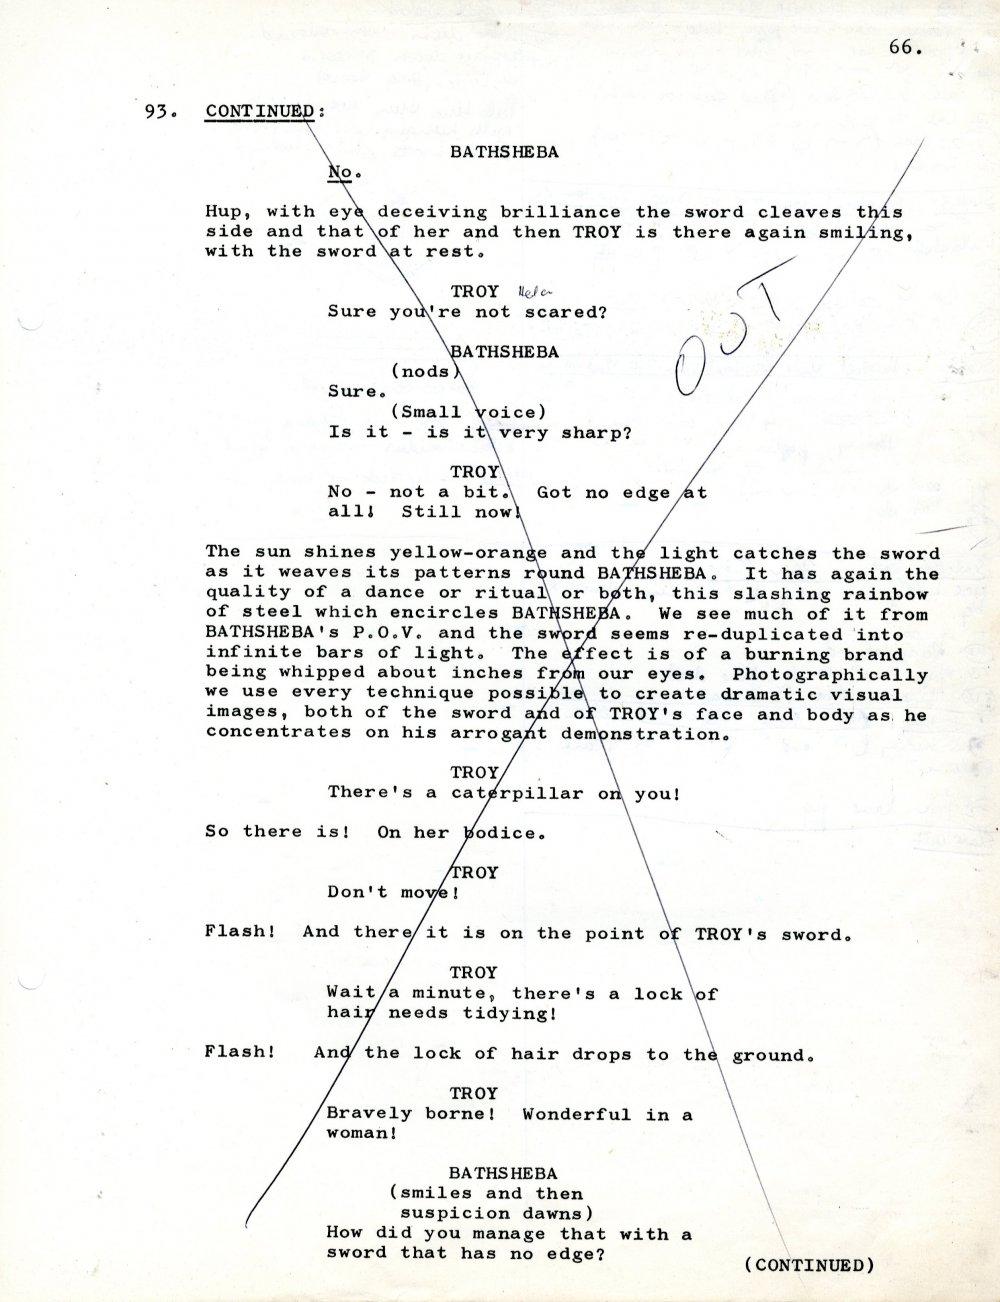 Early draft of sword scene